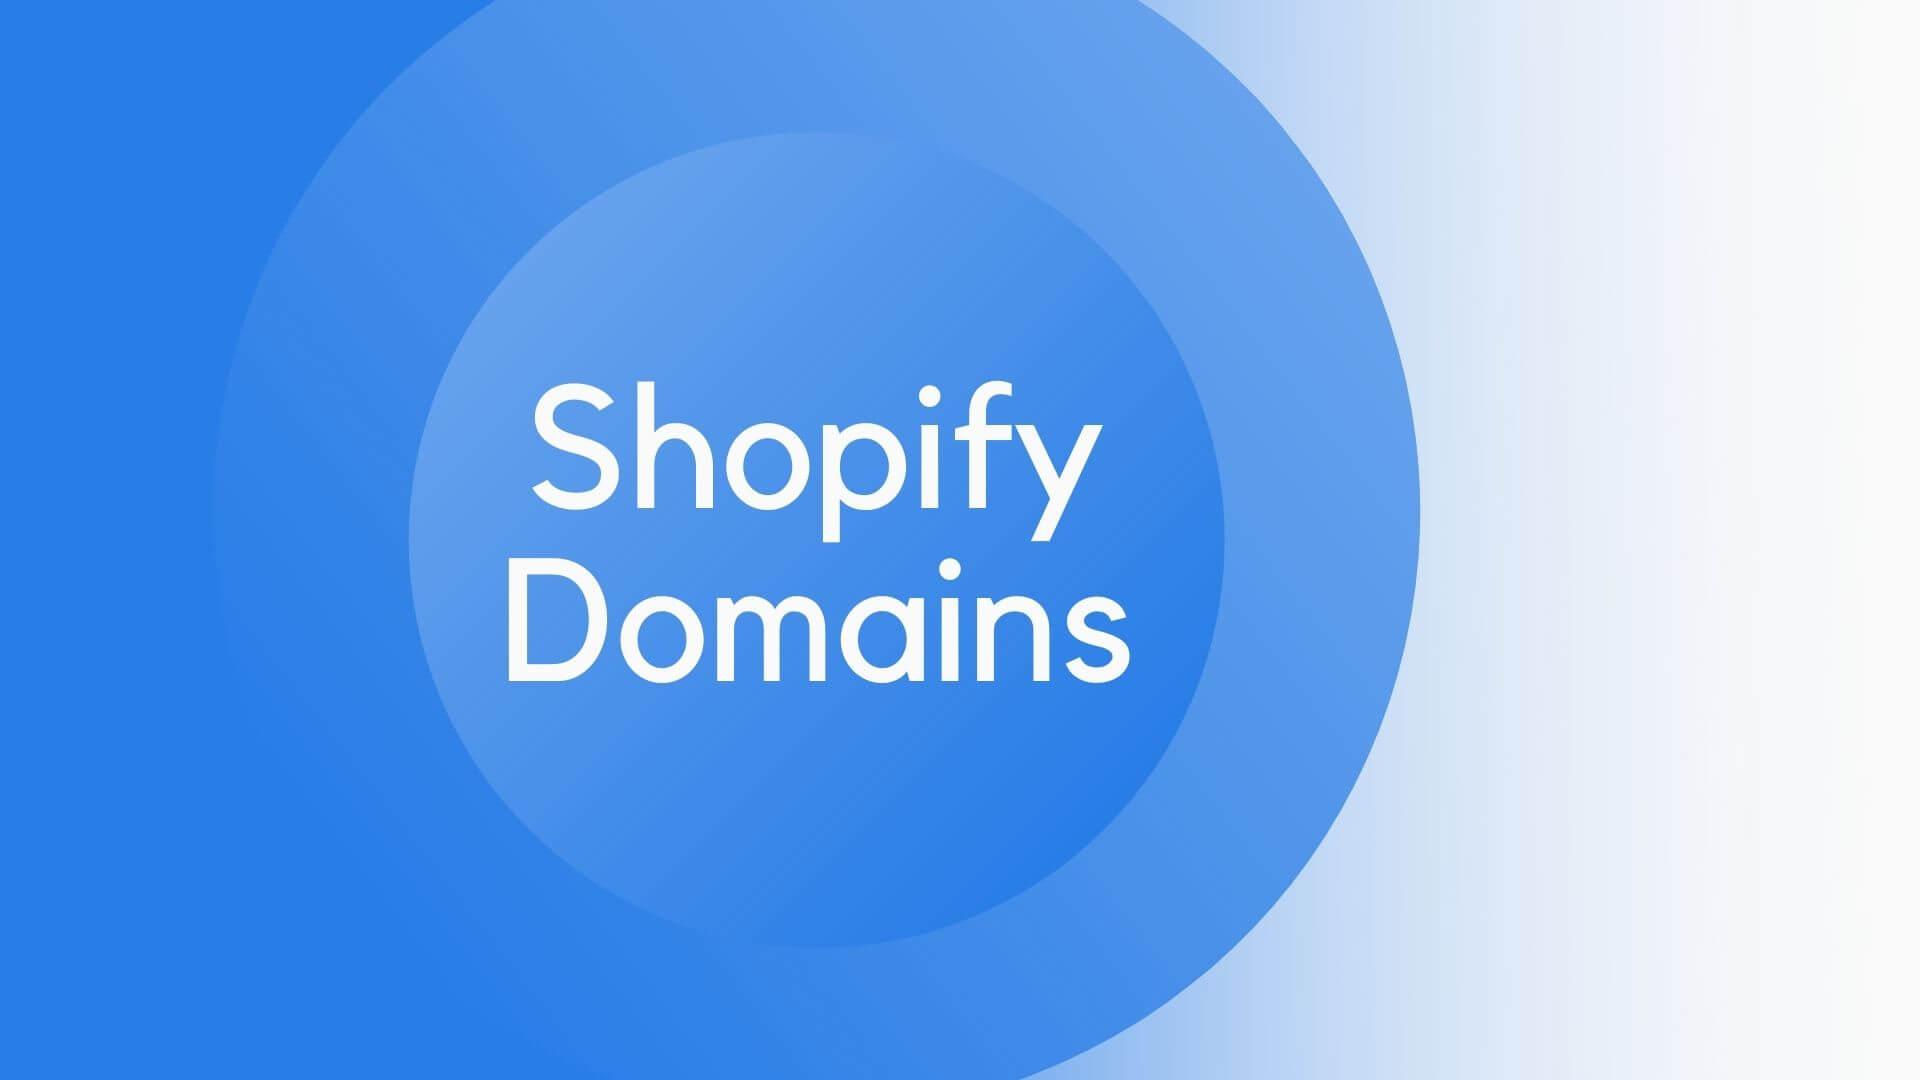 Shopify Domains